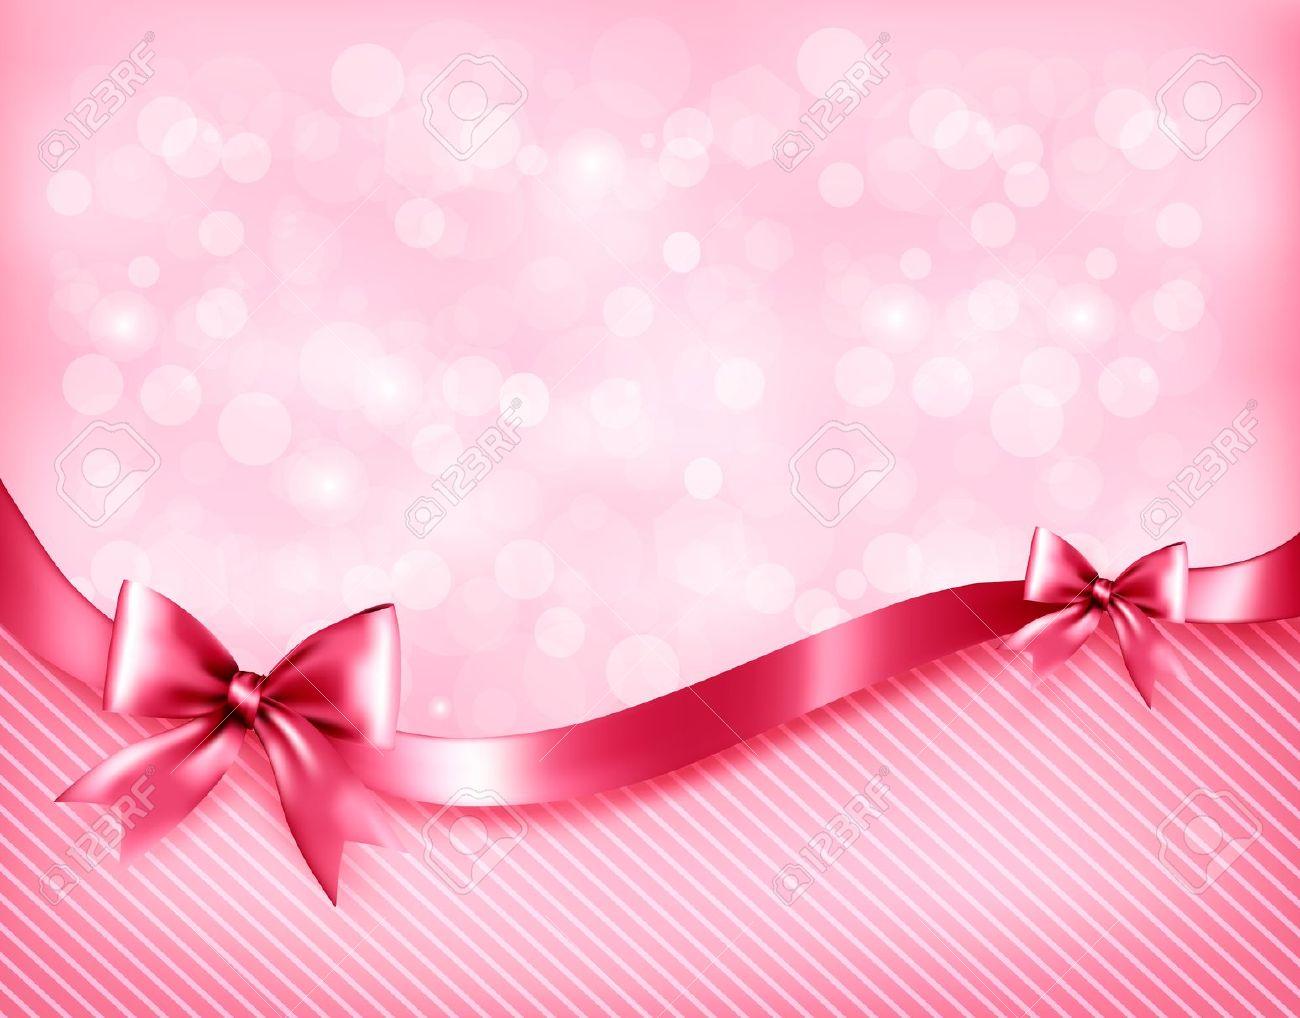 Pink Background #3B Plain Vector #6248 Wallpaper | Forrestkyle Gallery